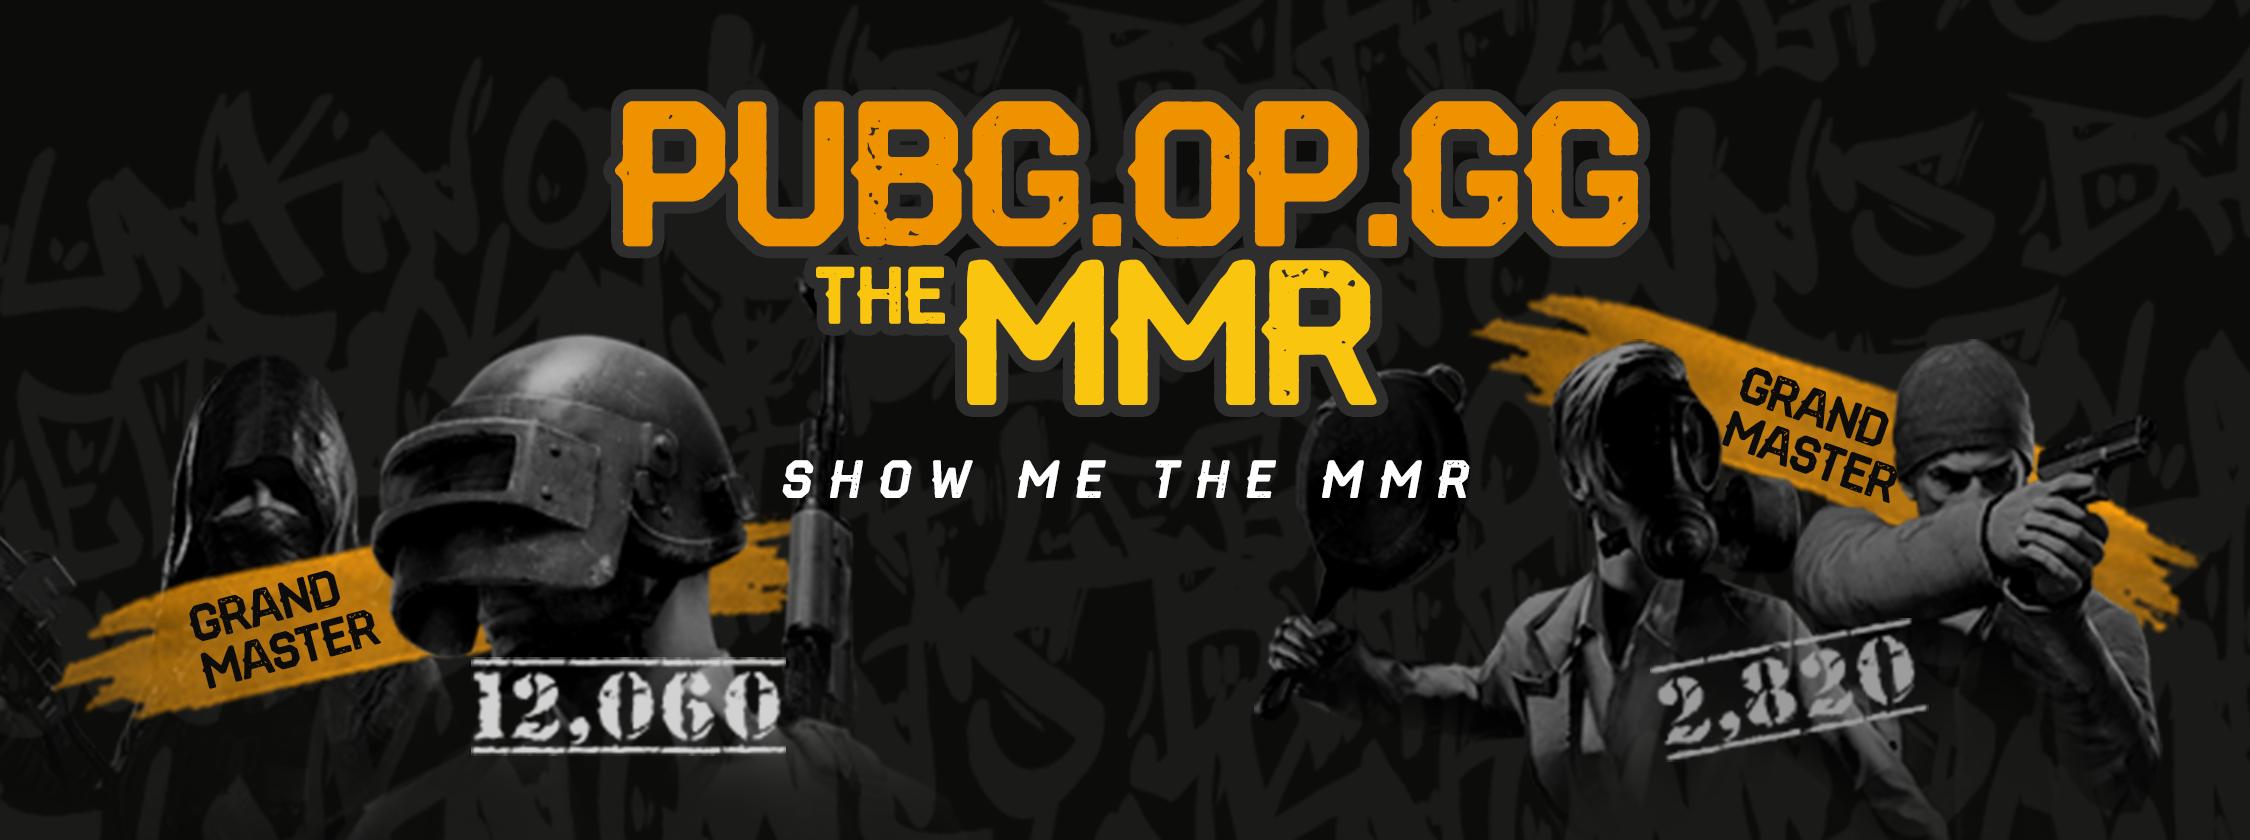 pubg.op.gg the MMR. show me the MMR